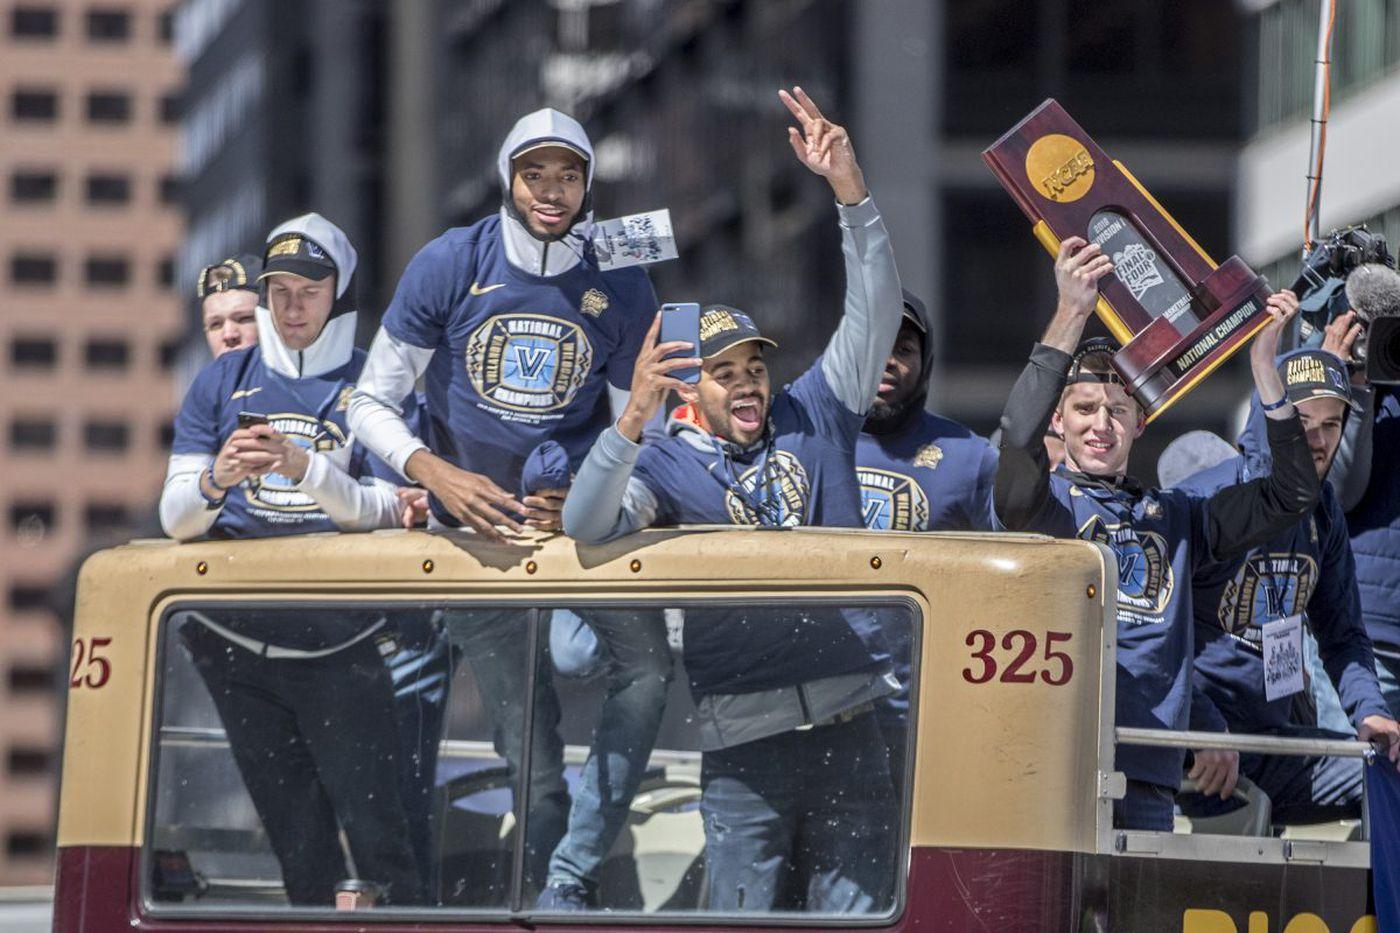 Villanova wins 2018 NCAA championship: Our special section